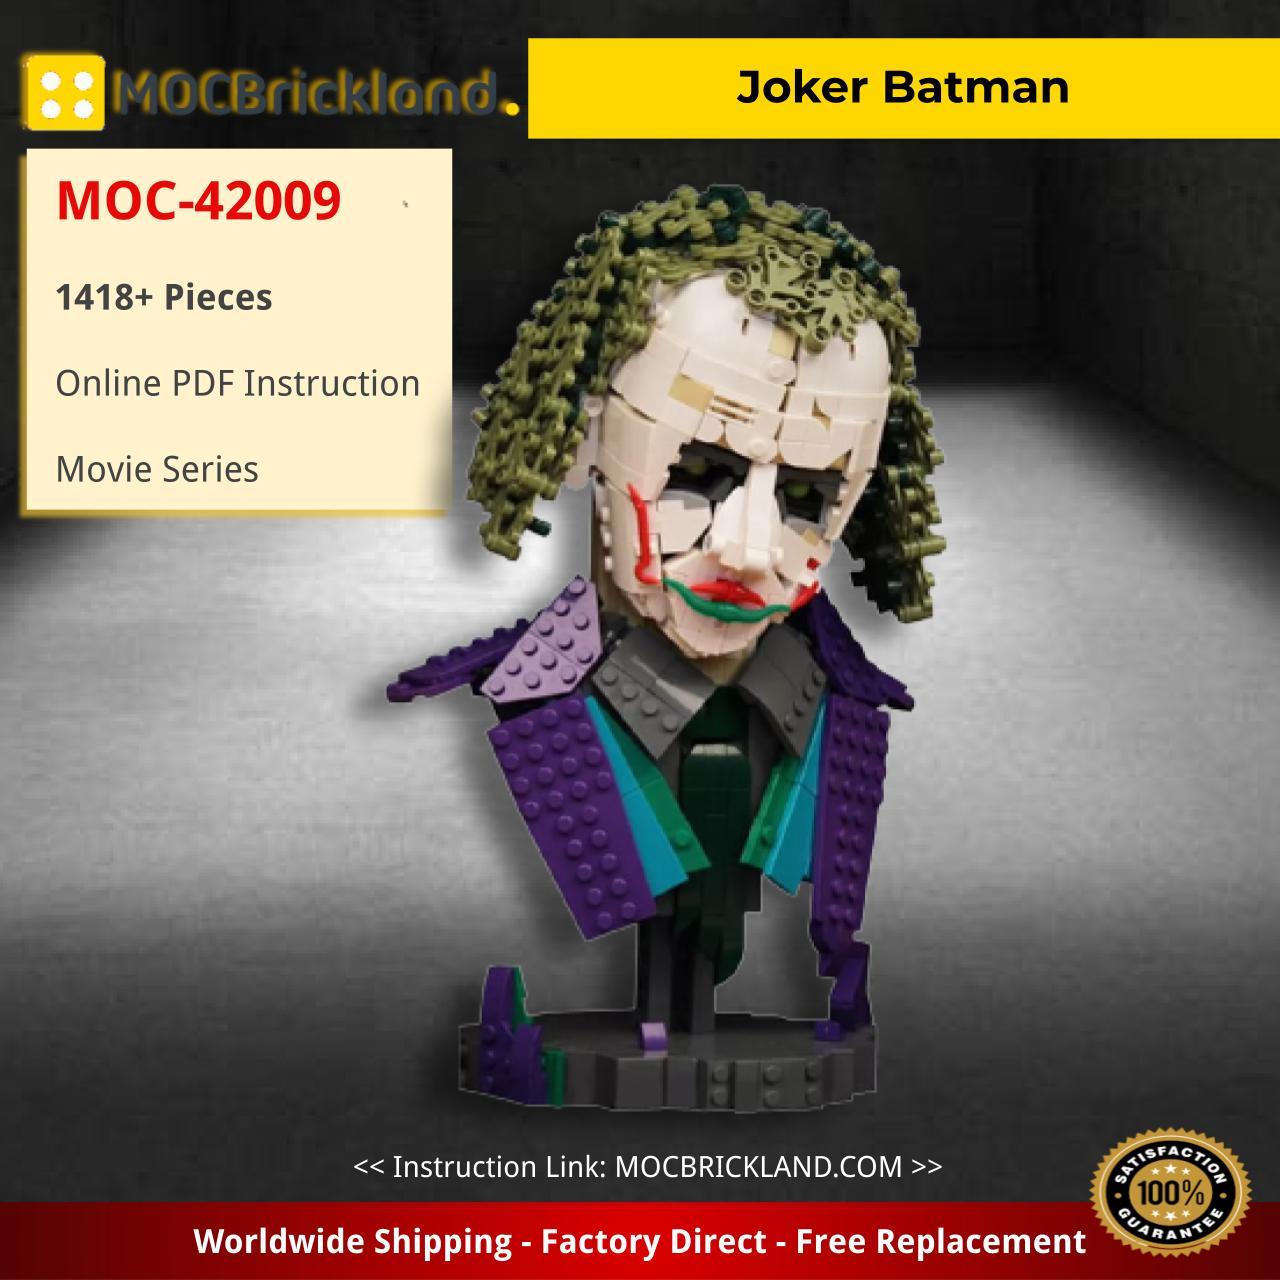 Joker Batman Movie MOC-42009 by Timofey_Tkachev WITH 1418 PIECES